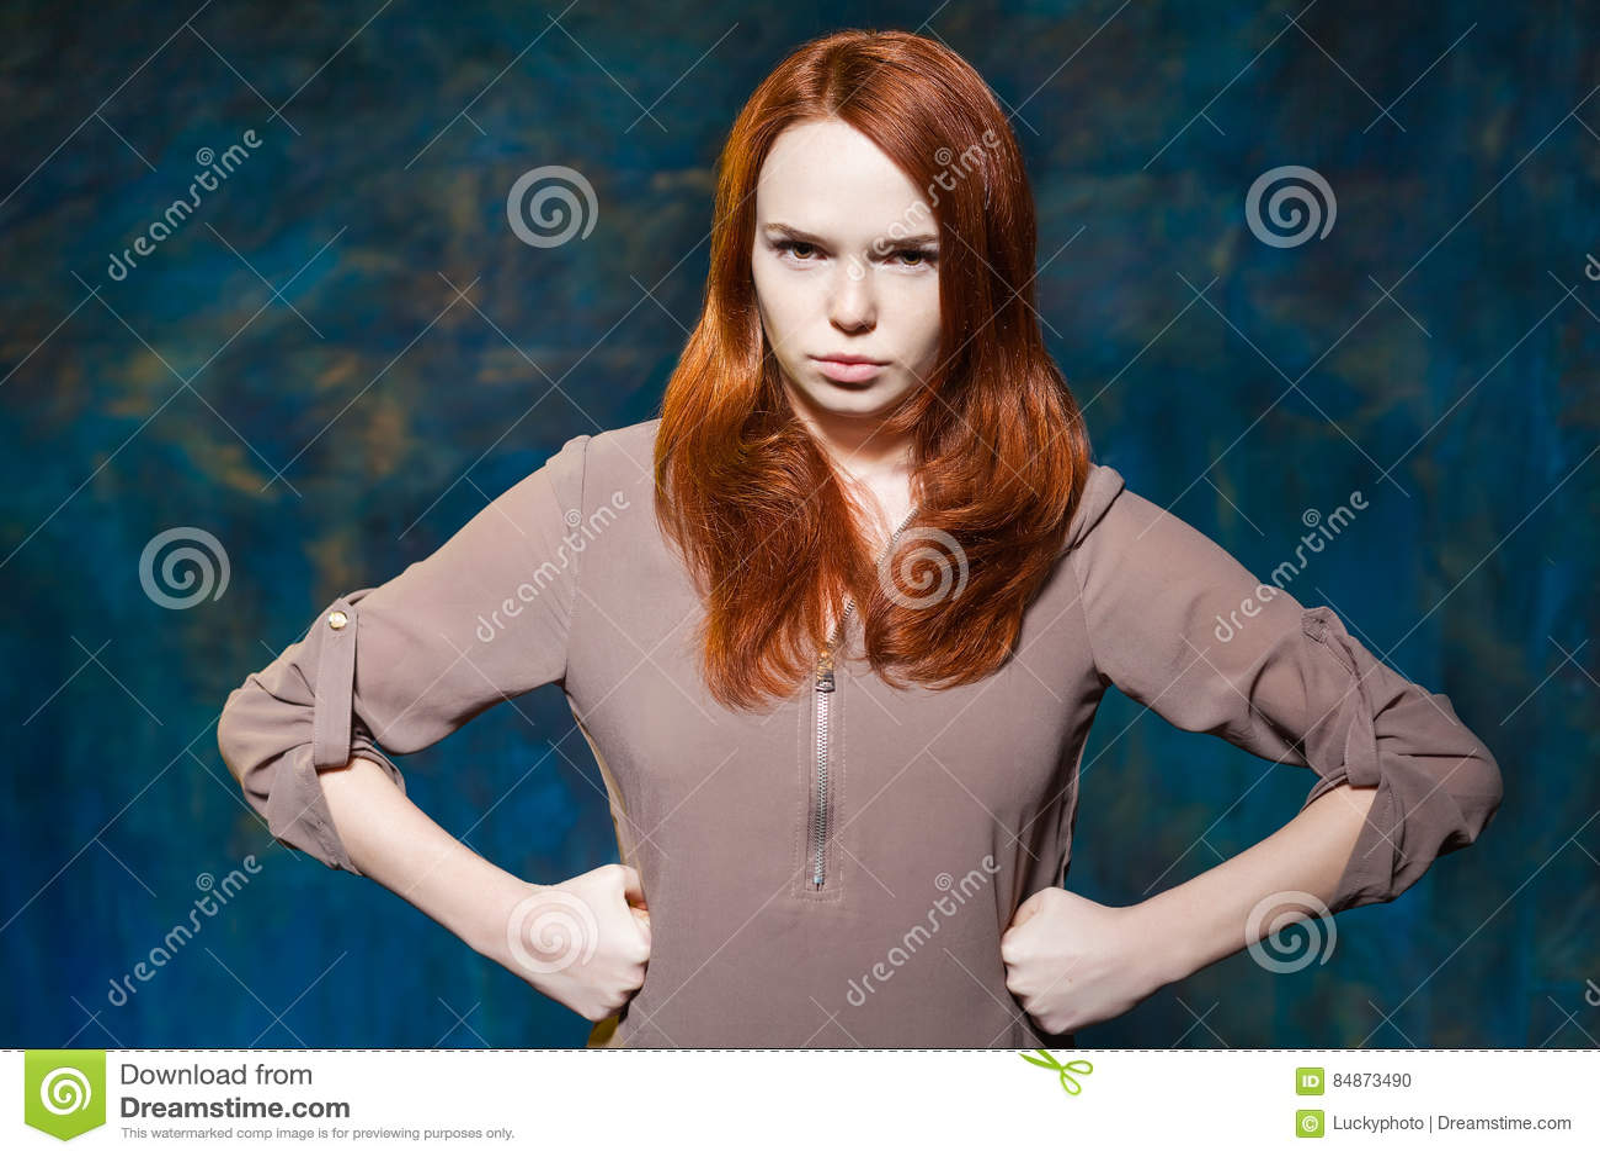 You Angry redhead girl